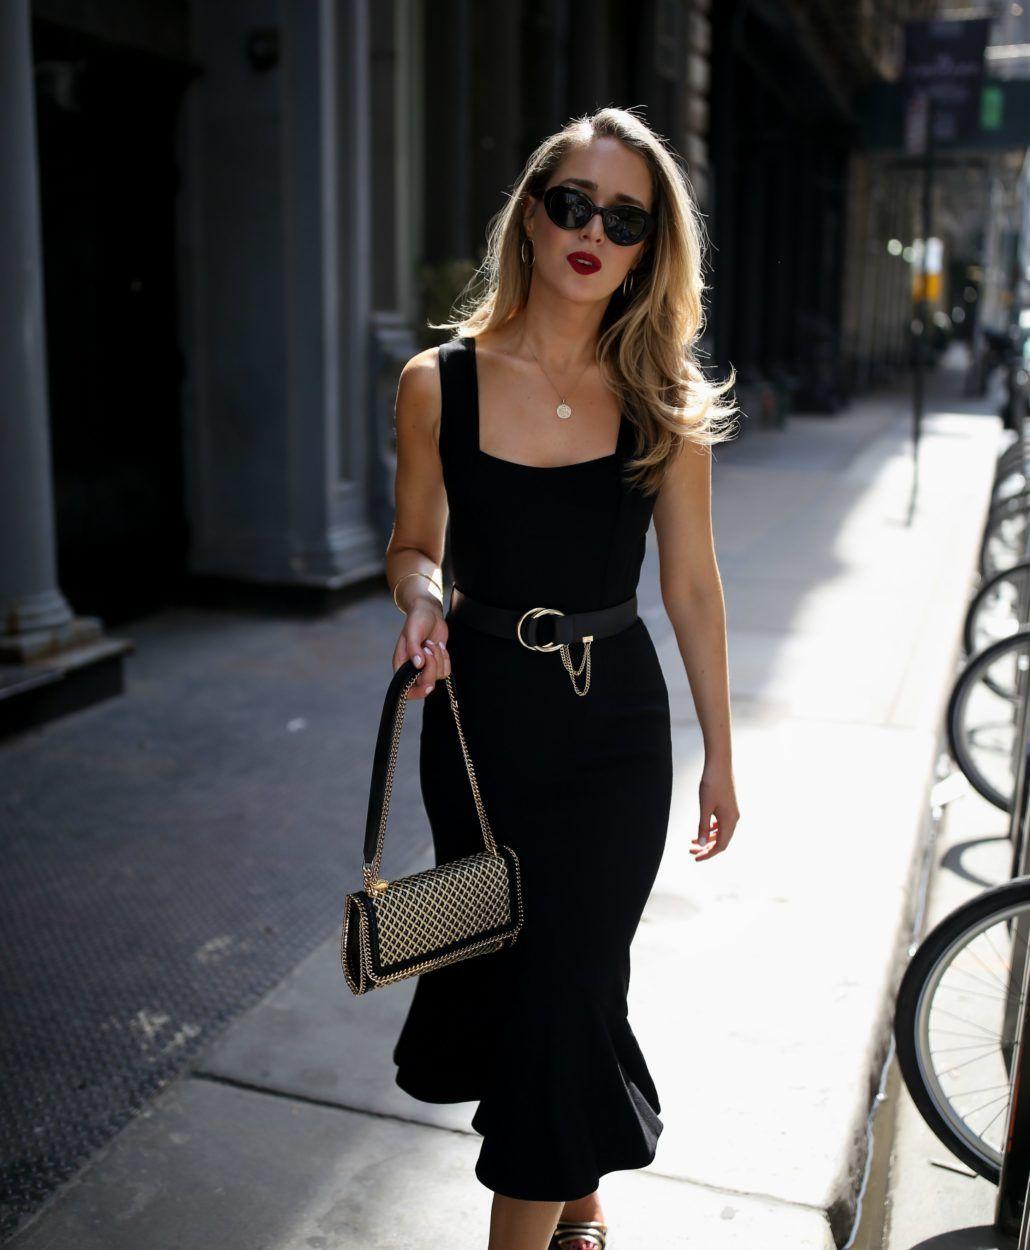 Date Night Memorandum Nyc Fashion Lifestyle Blog For The Working Girl Fashion Fashion Lifestyle Blog Funeral Outfit [ 1250 x 1030 Pixel ]